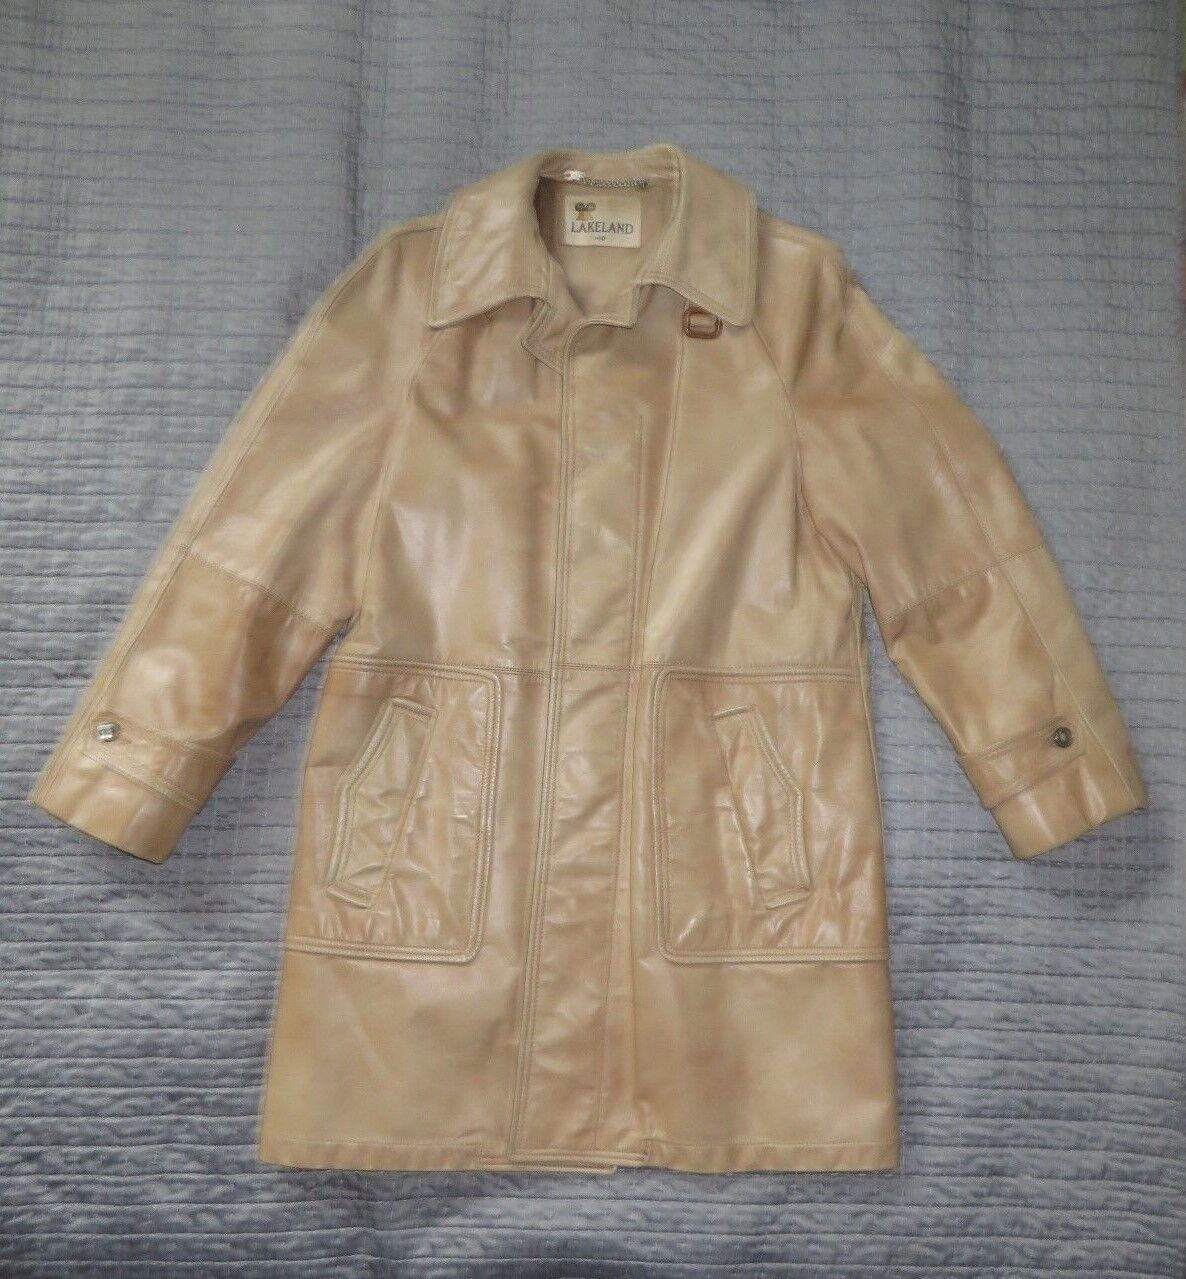 Vintage 70's Lakeland Men's Leather Trench Coat, Size 40